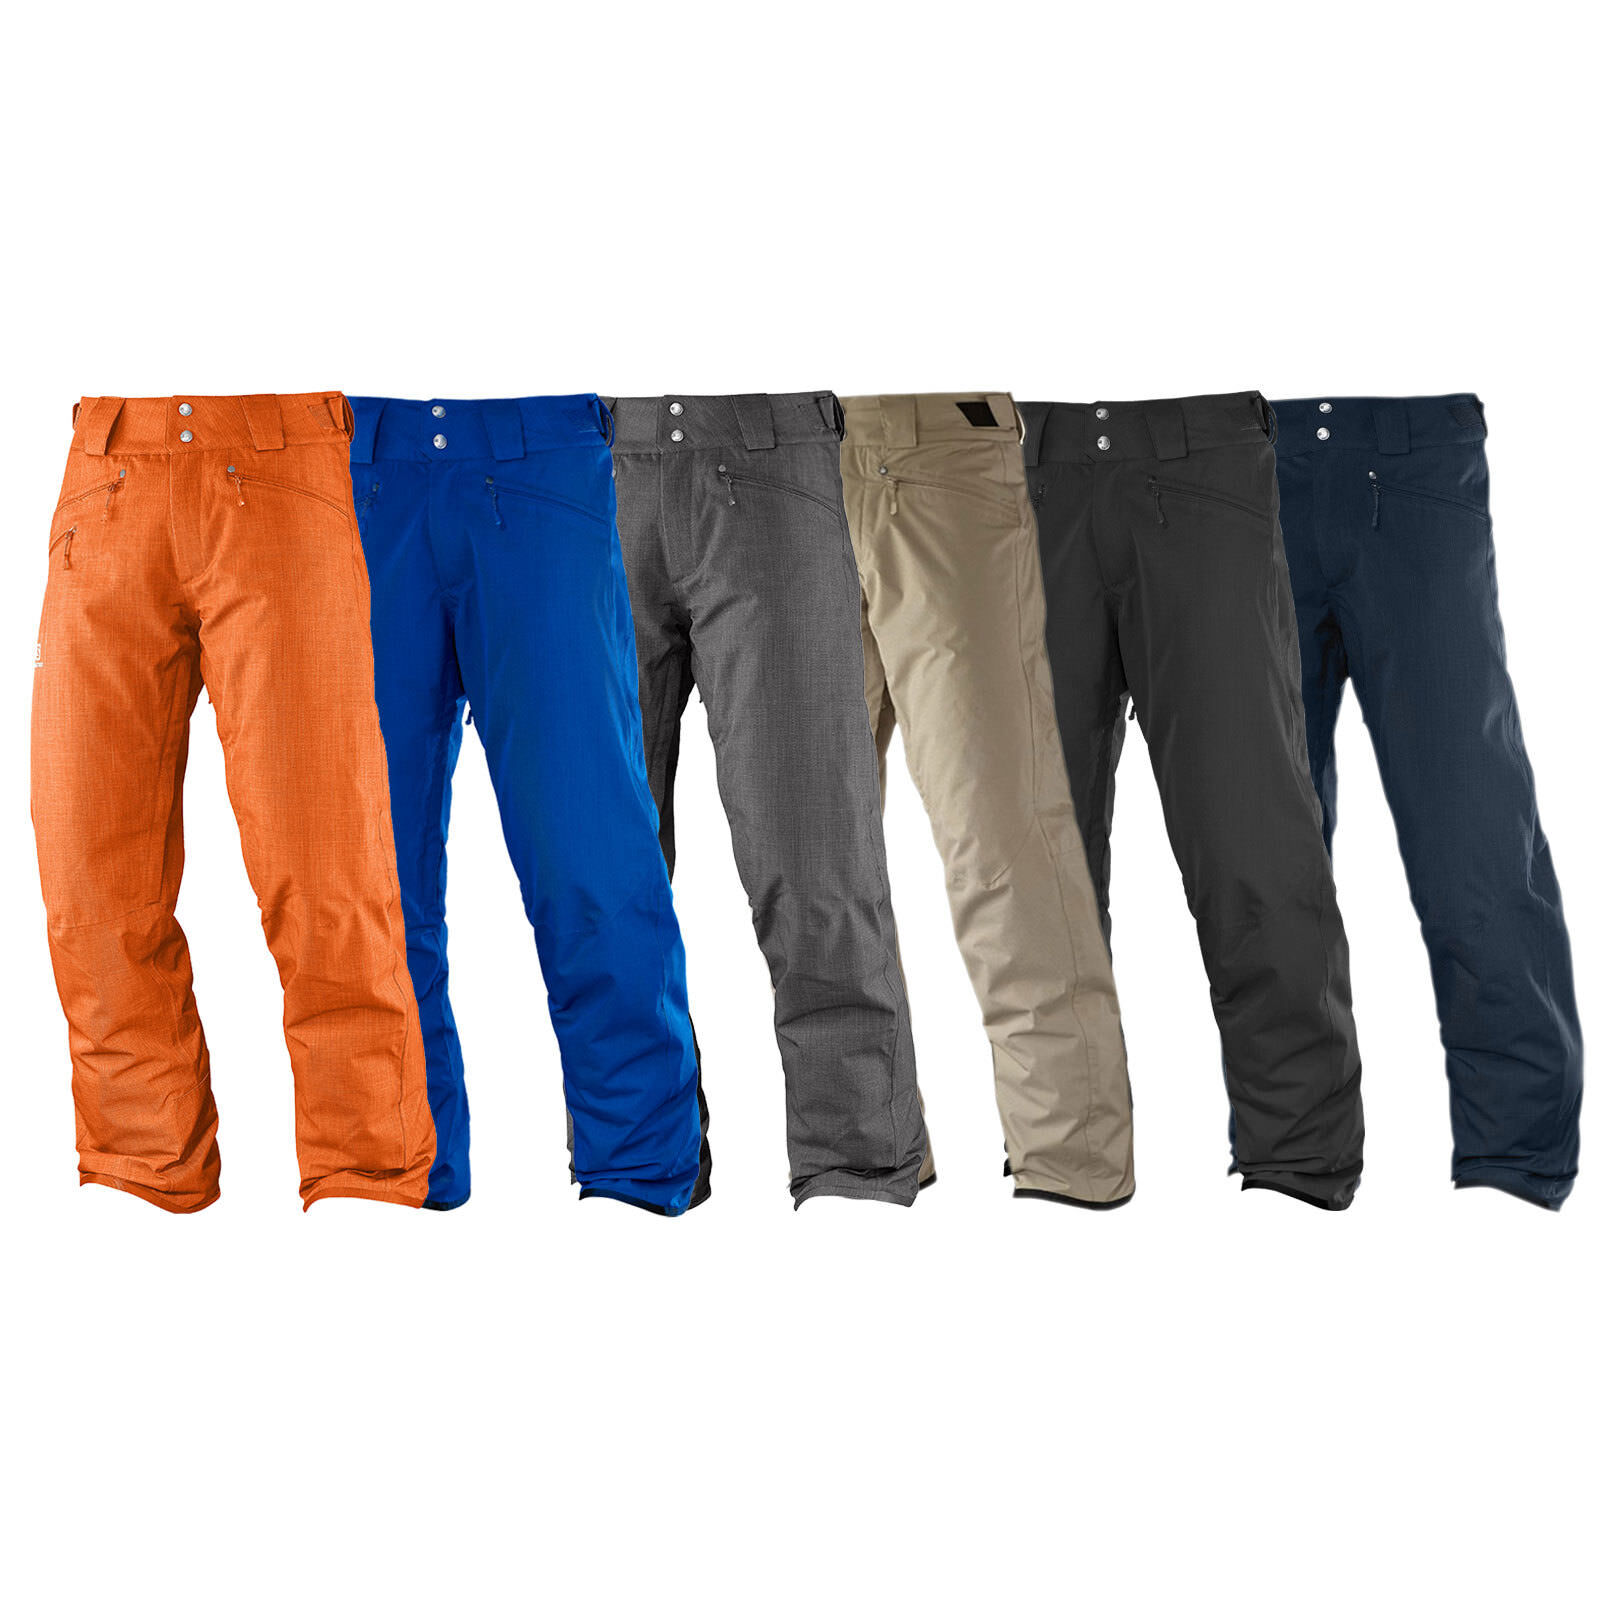 Salomon Fantasy Men's Trousers Ski Snowboard Winter Pants Working